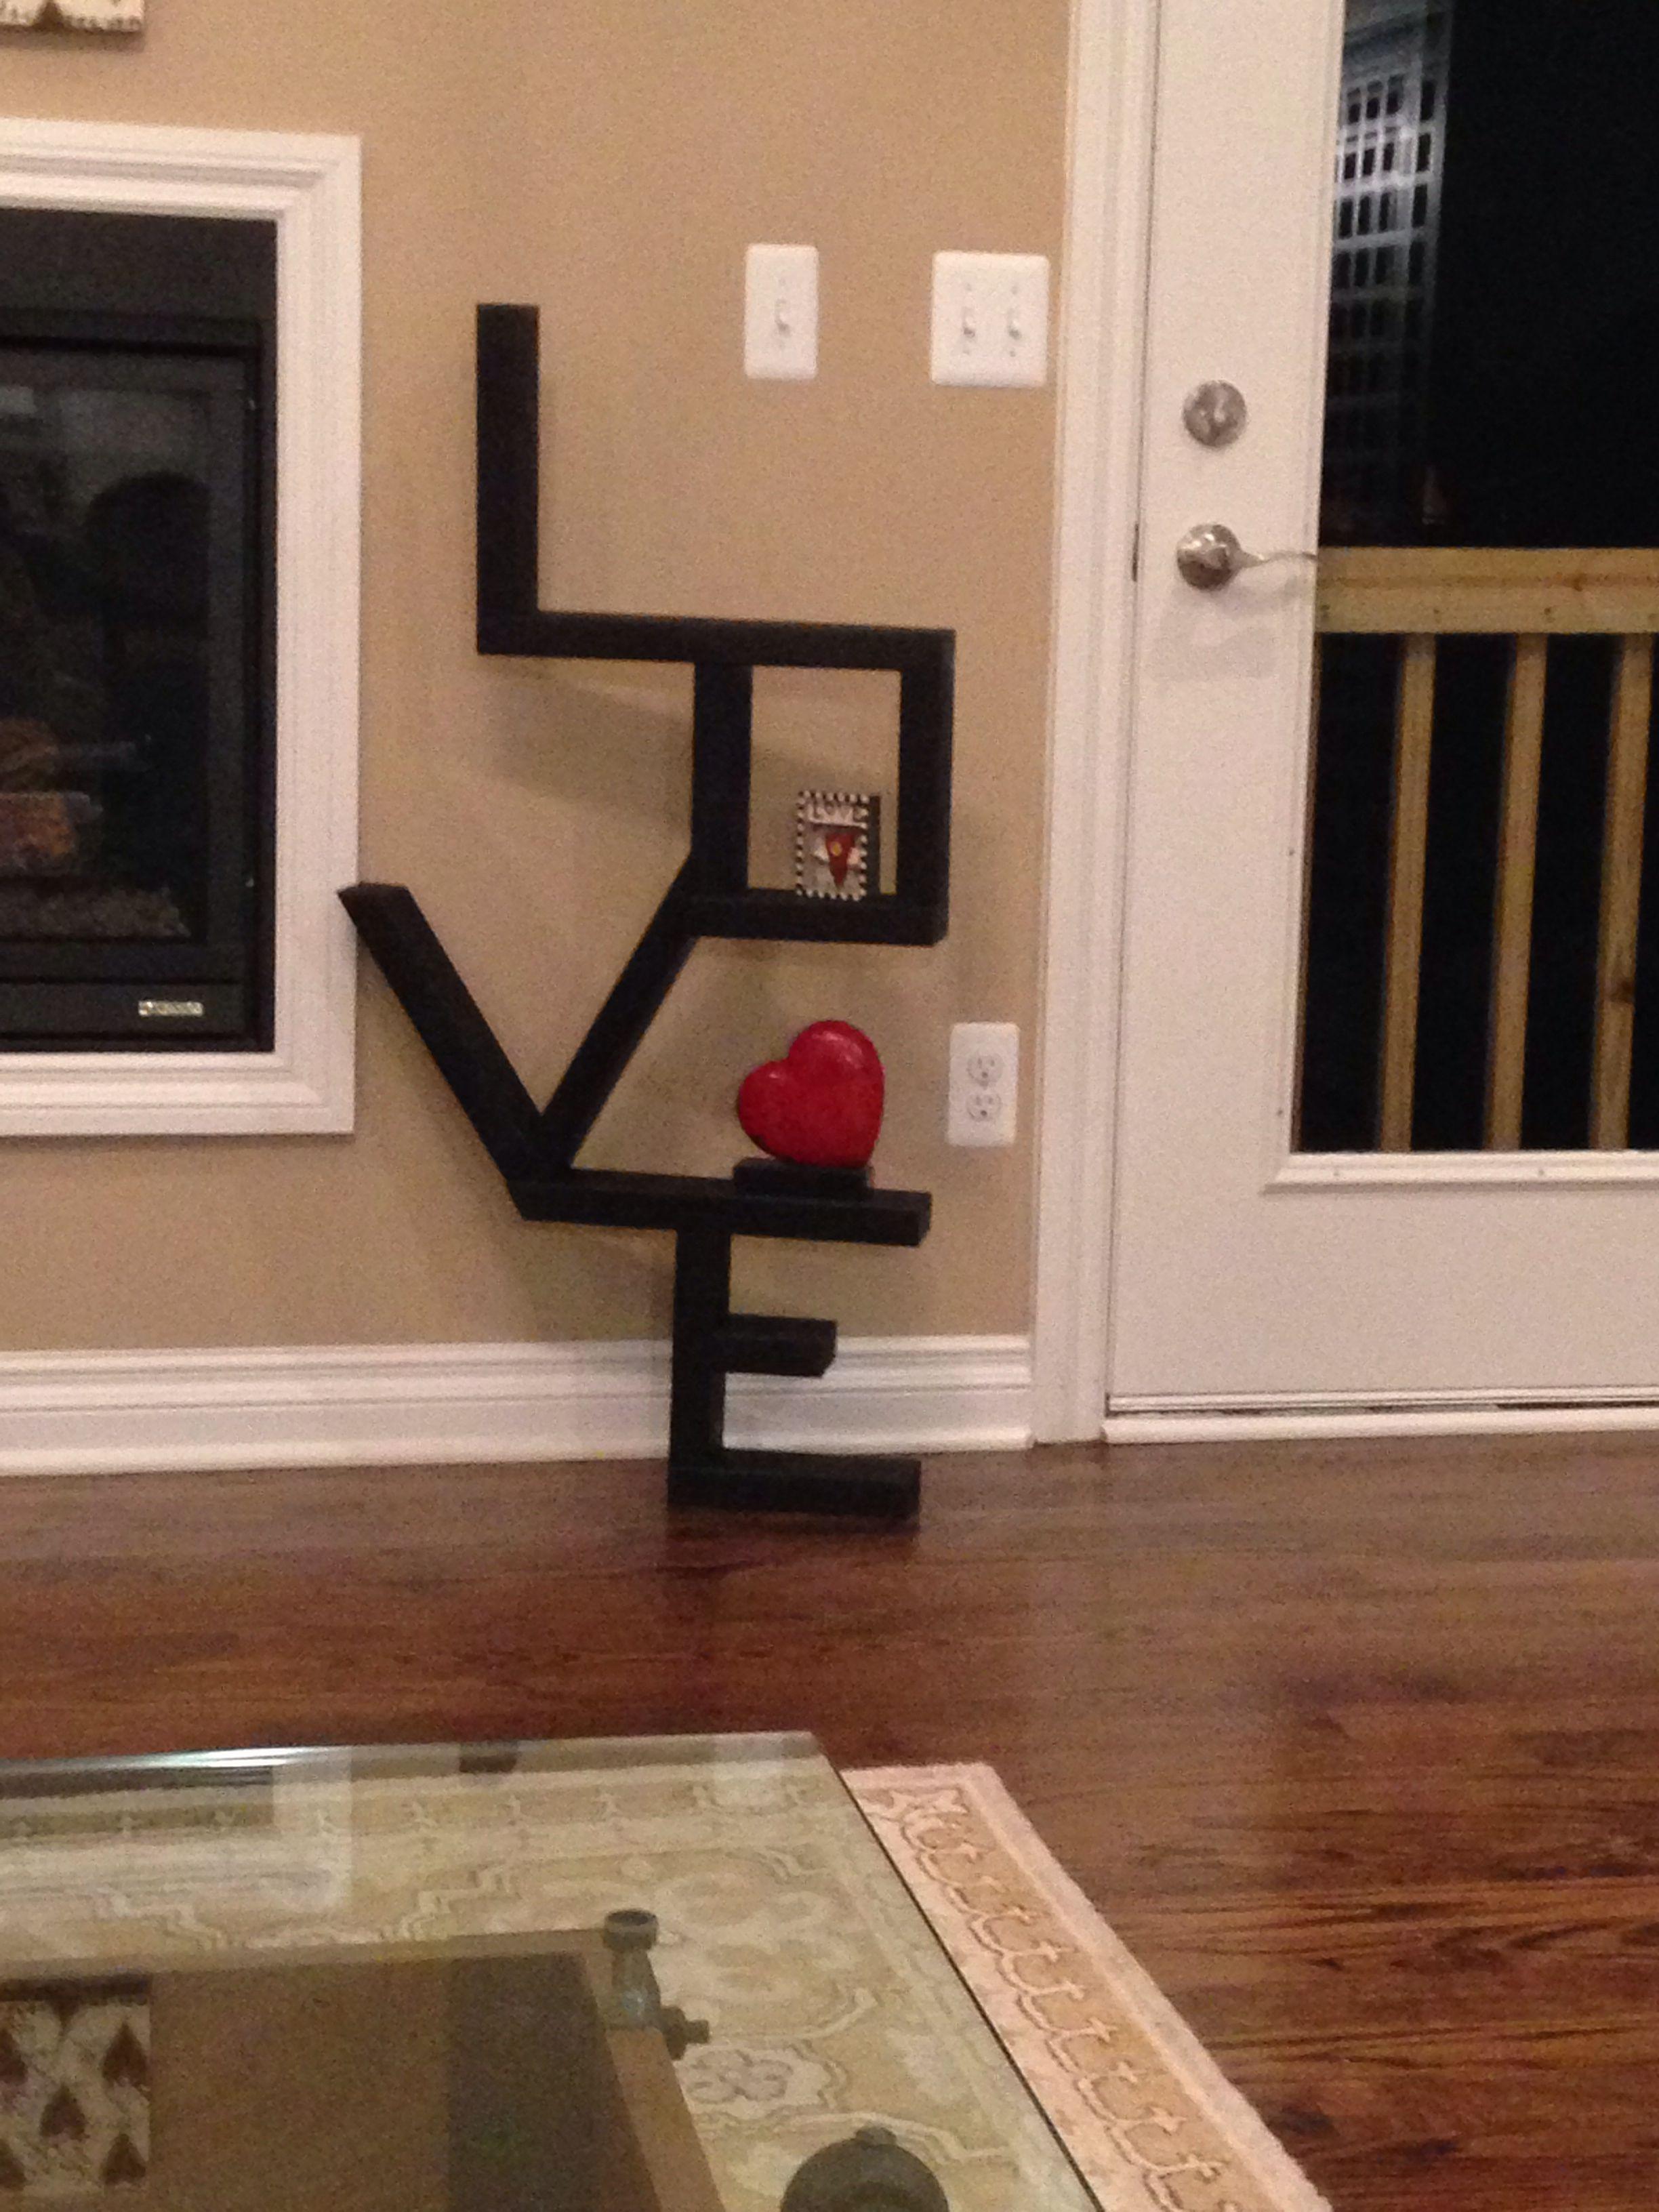 2x4 LOVE - DIY shelf cost$5.00 | Home ideas I ️ | Home ...